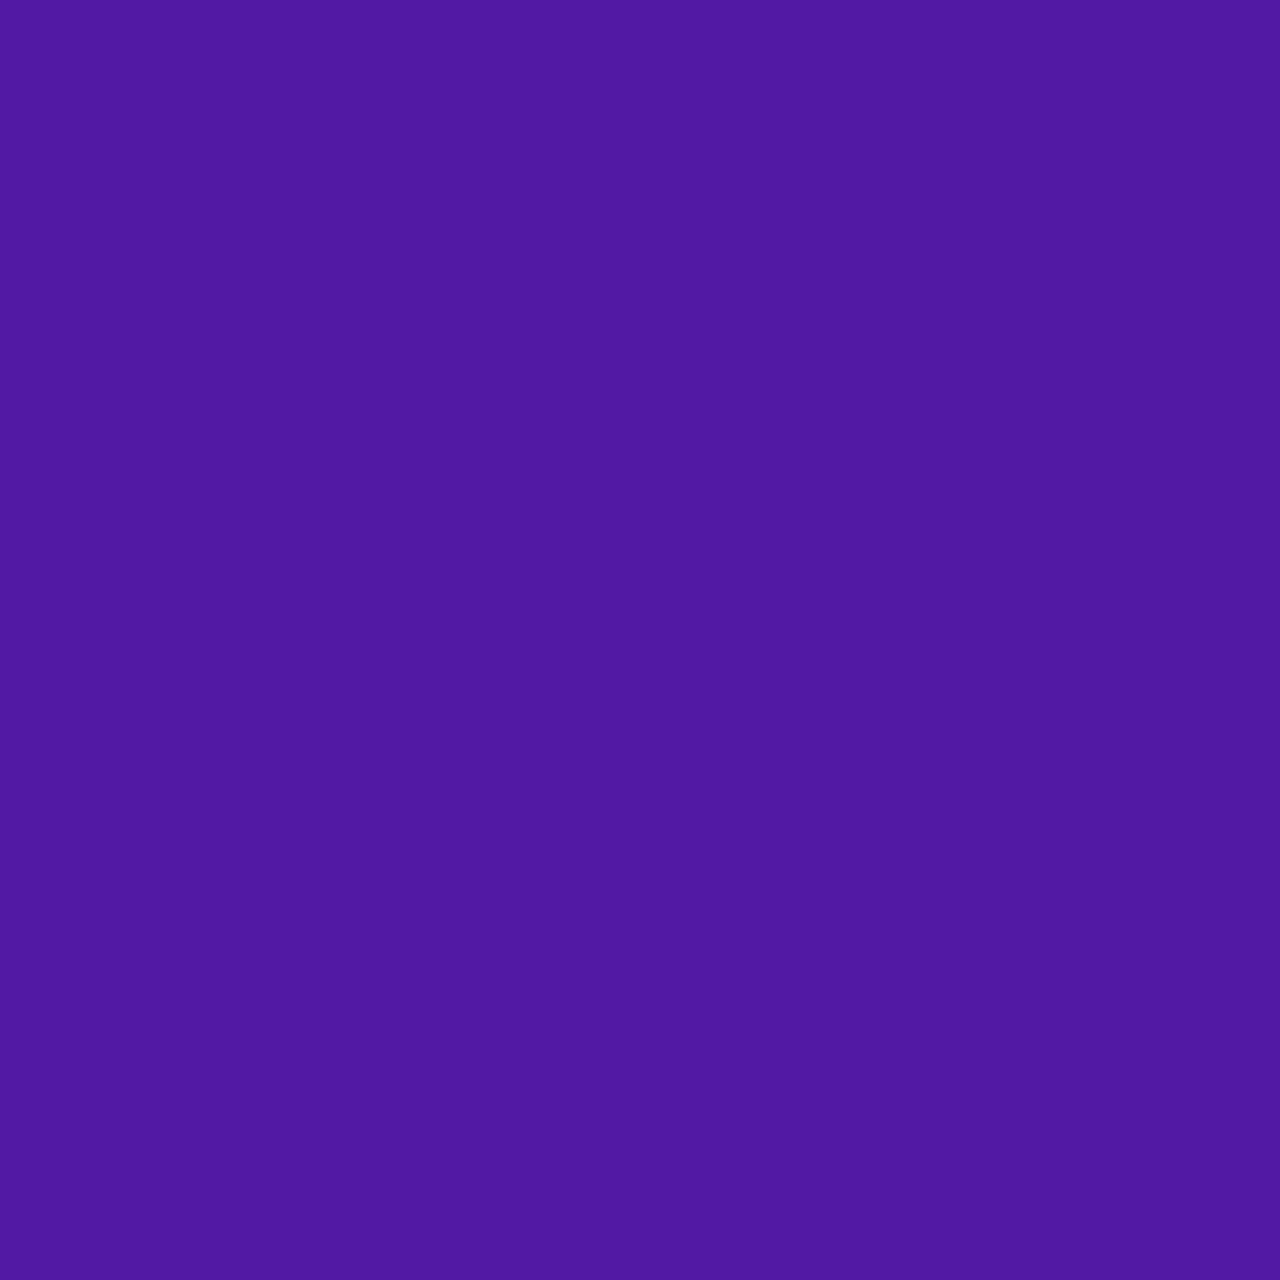 "#0057 Rosco Gels Roscolux Lavender, 20x24"""